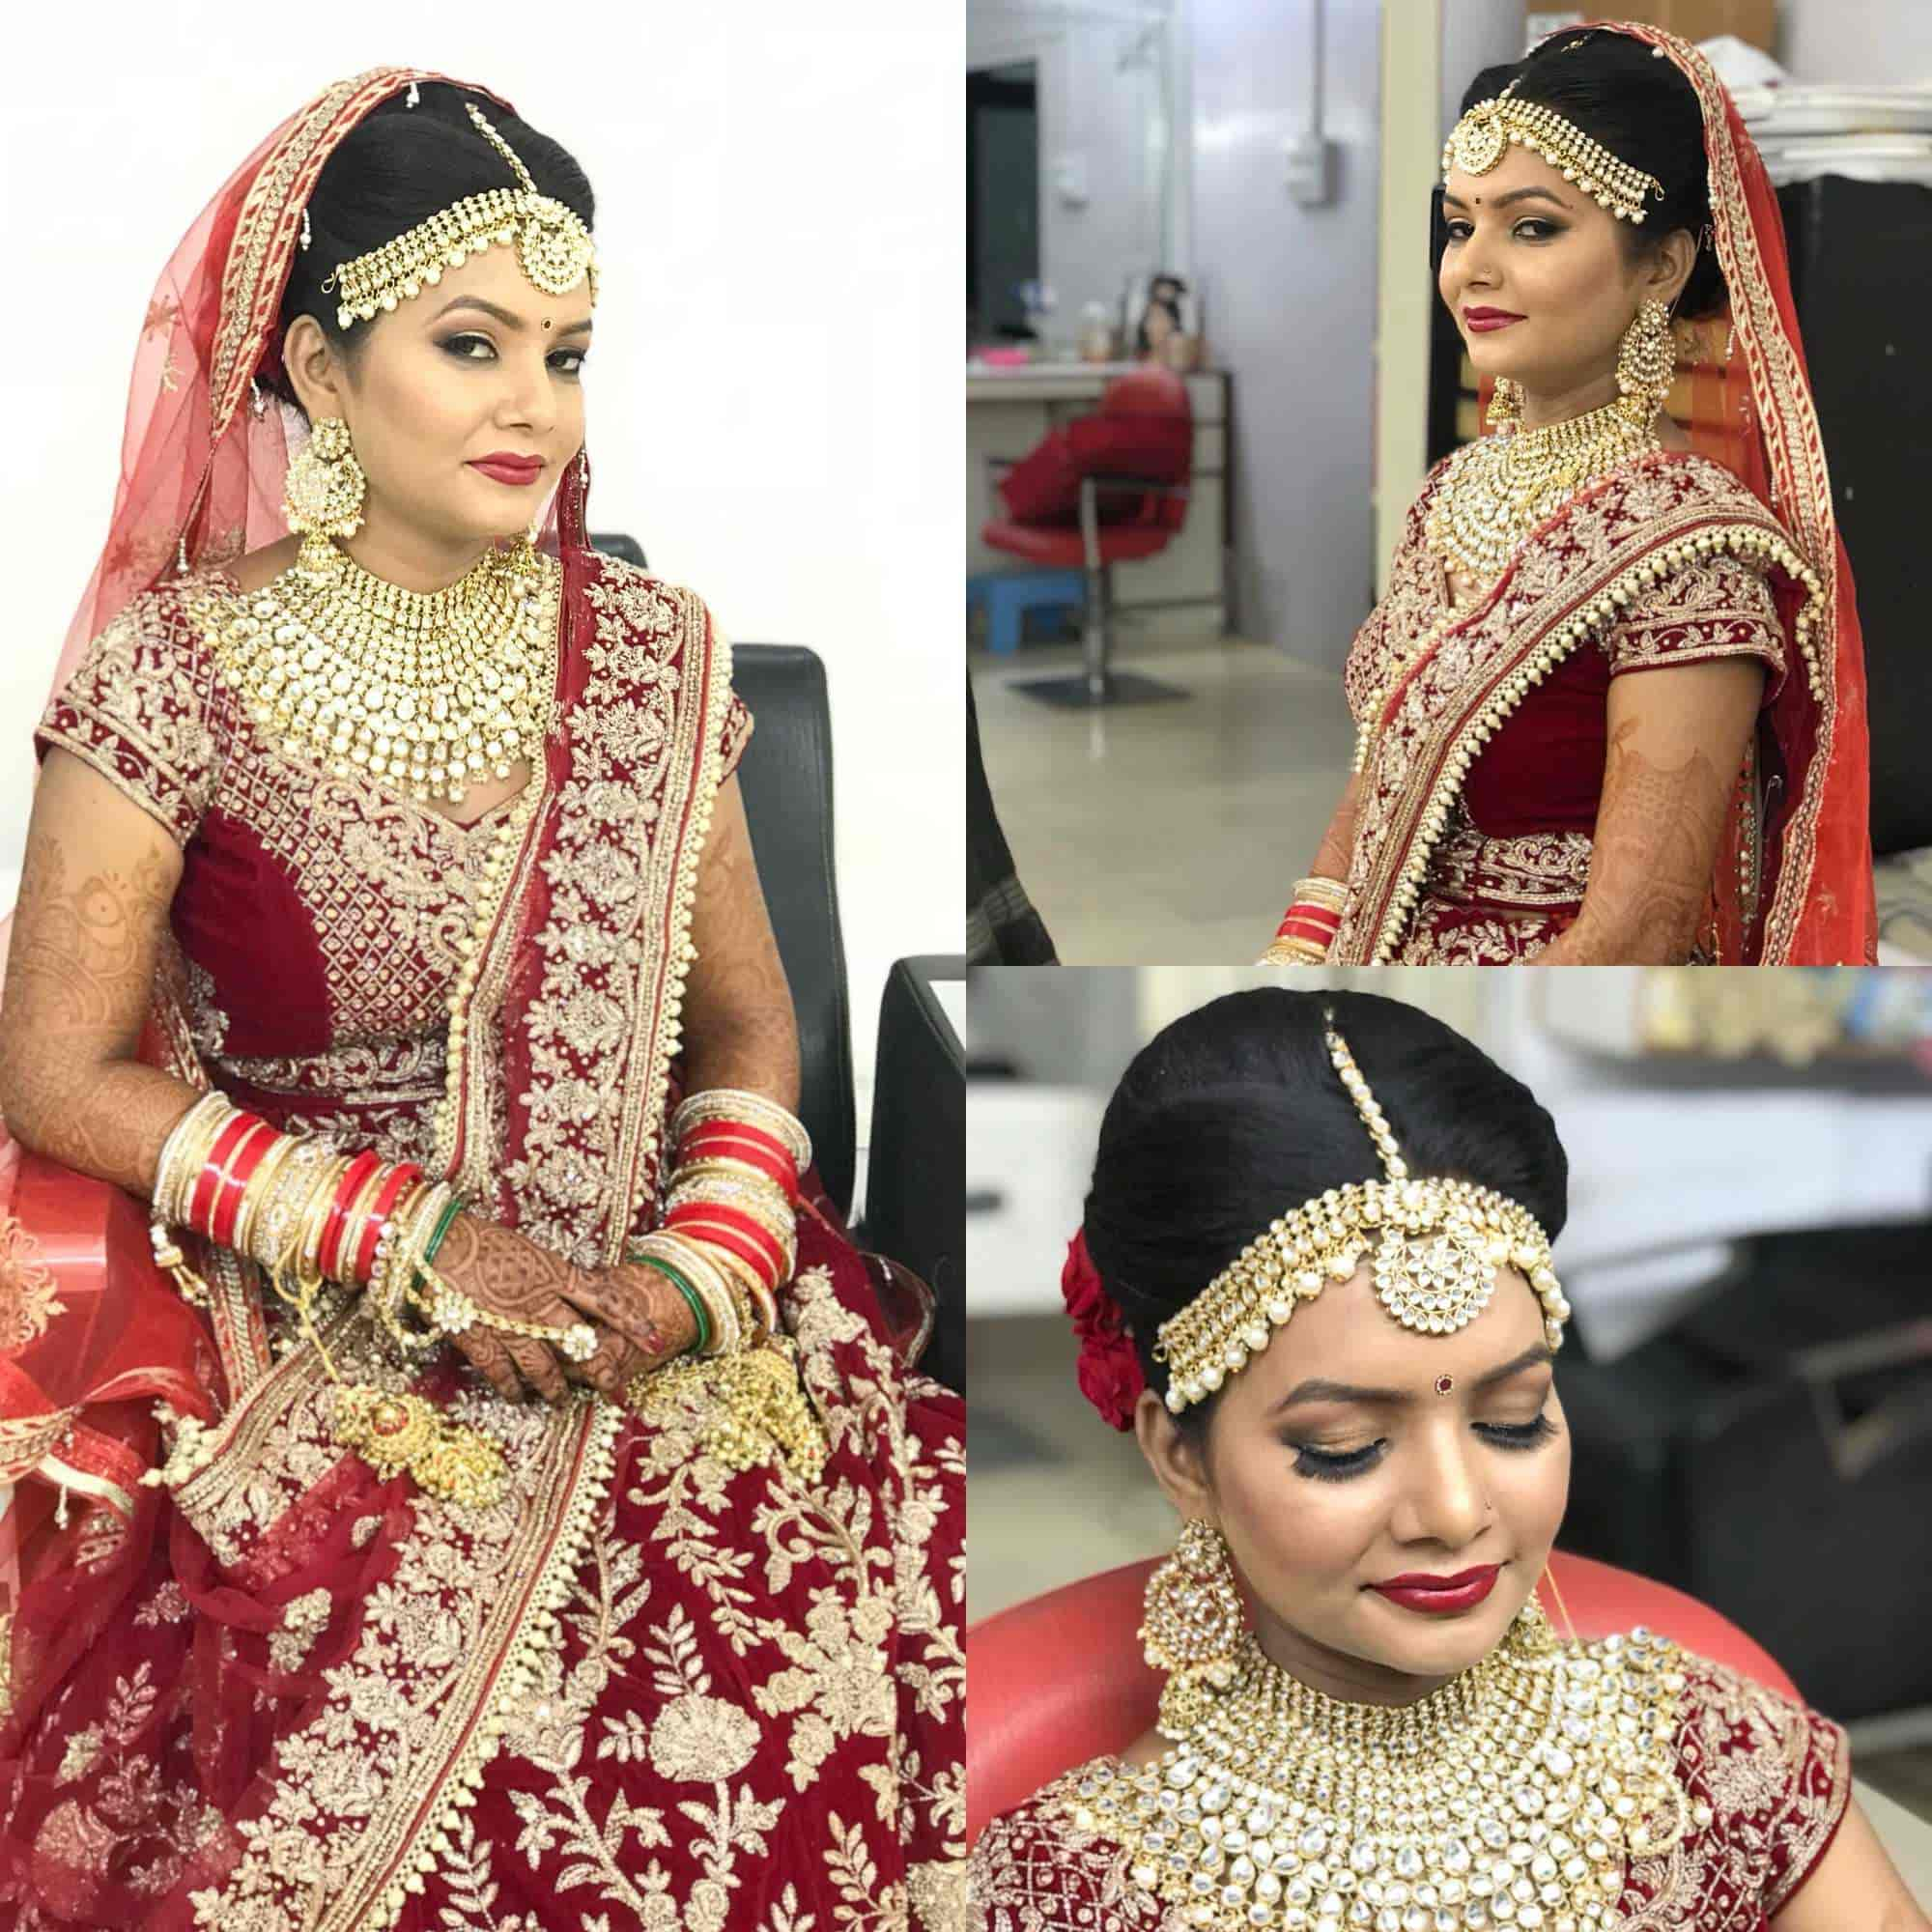 Green Beauty Parlour Sonipat Ho Beauty Parlours In